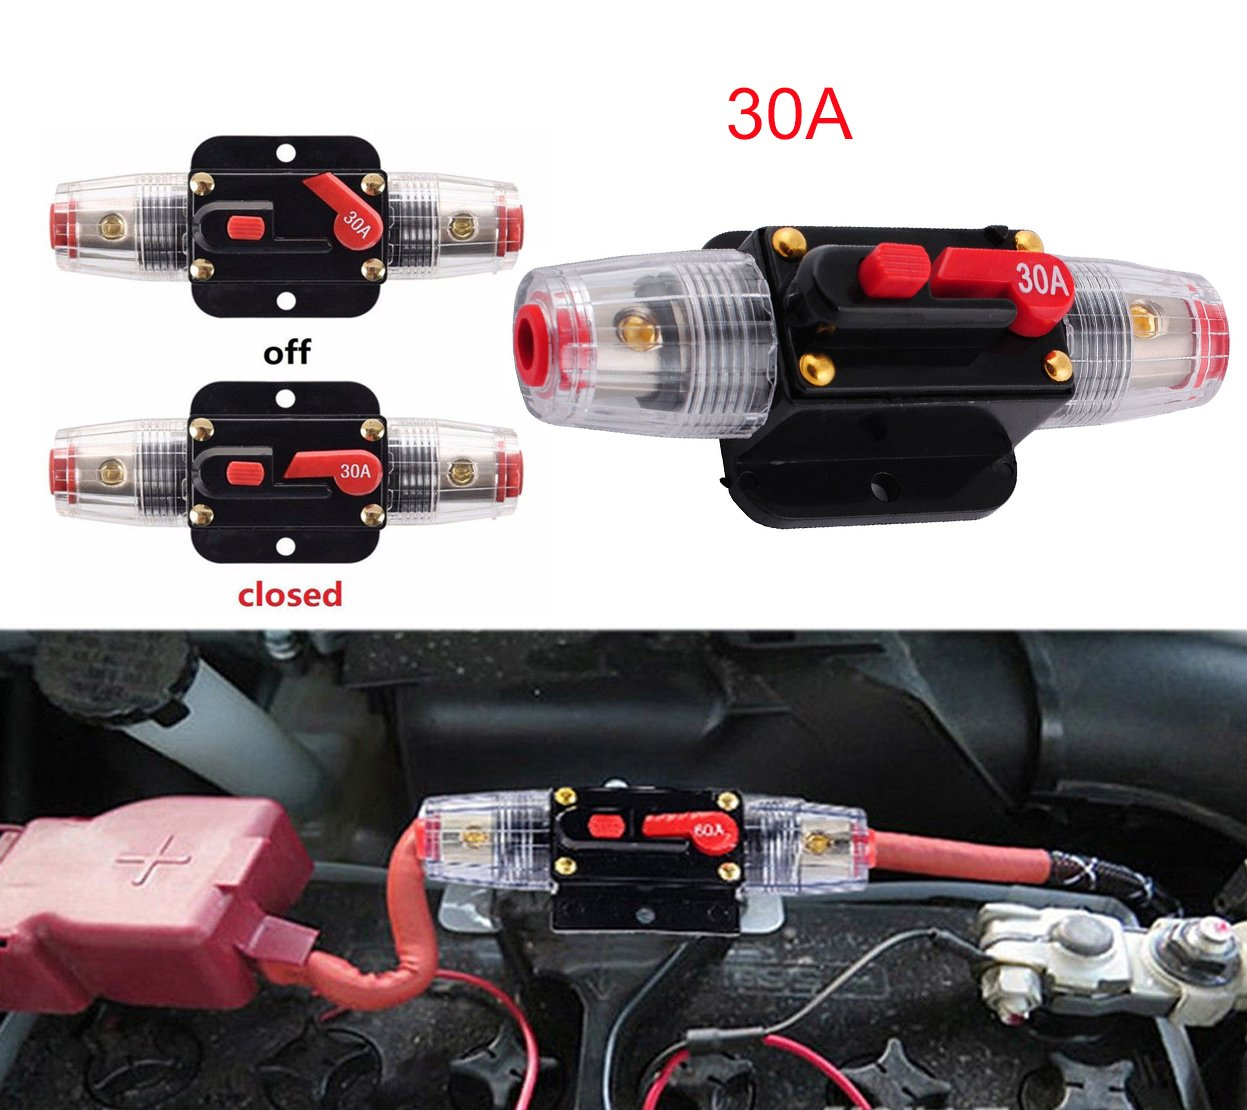 Podoy 12V DC 30A Car Audio Circuit Breaker for 12V System Protection